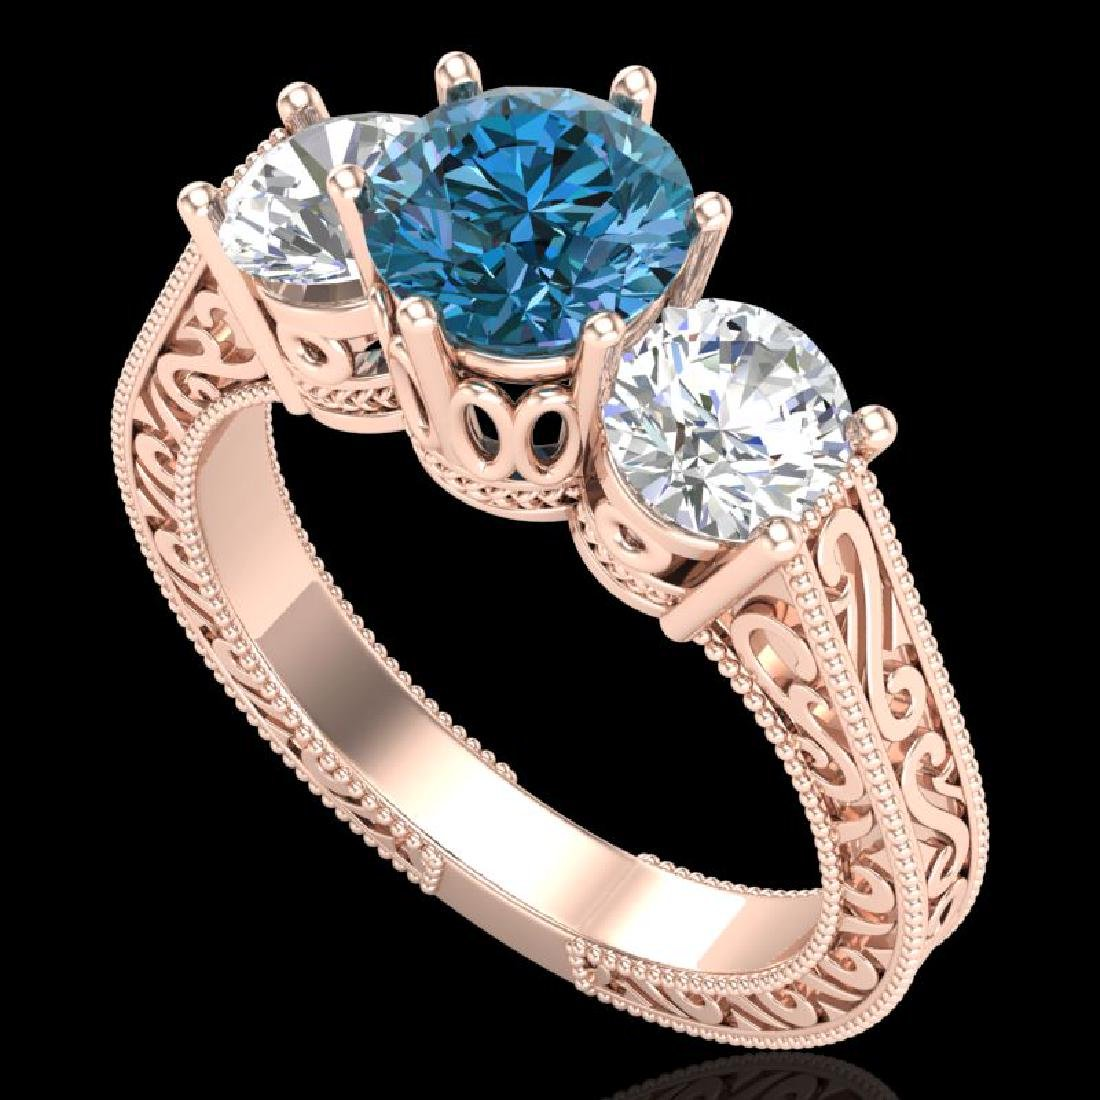 2.01 CTW Fancy Intense Blue Diamond Art Deco 3 Stone